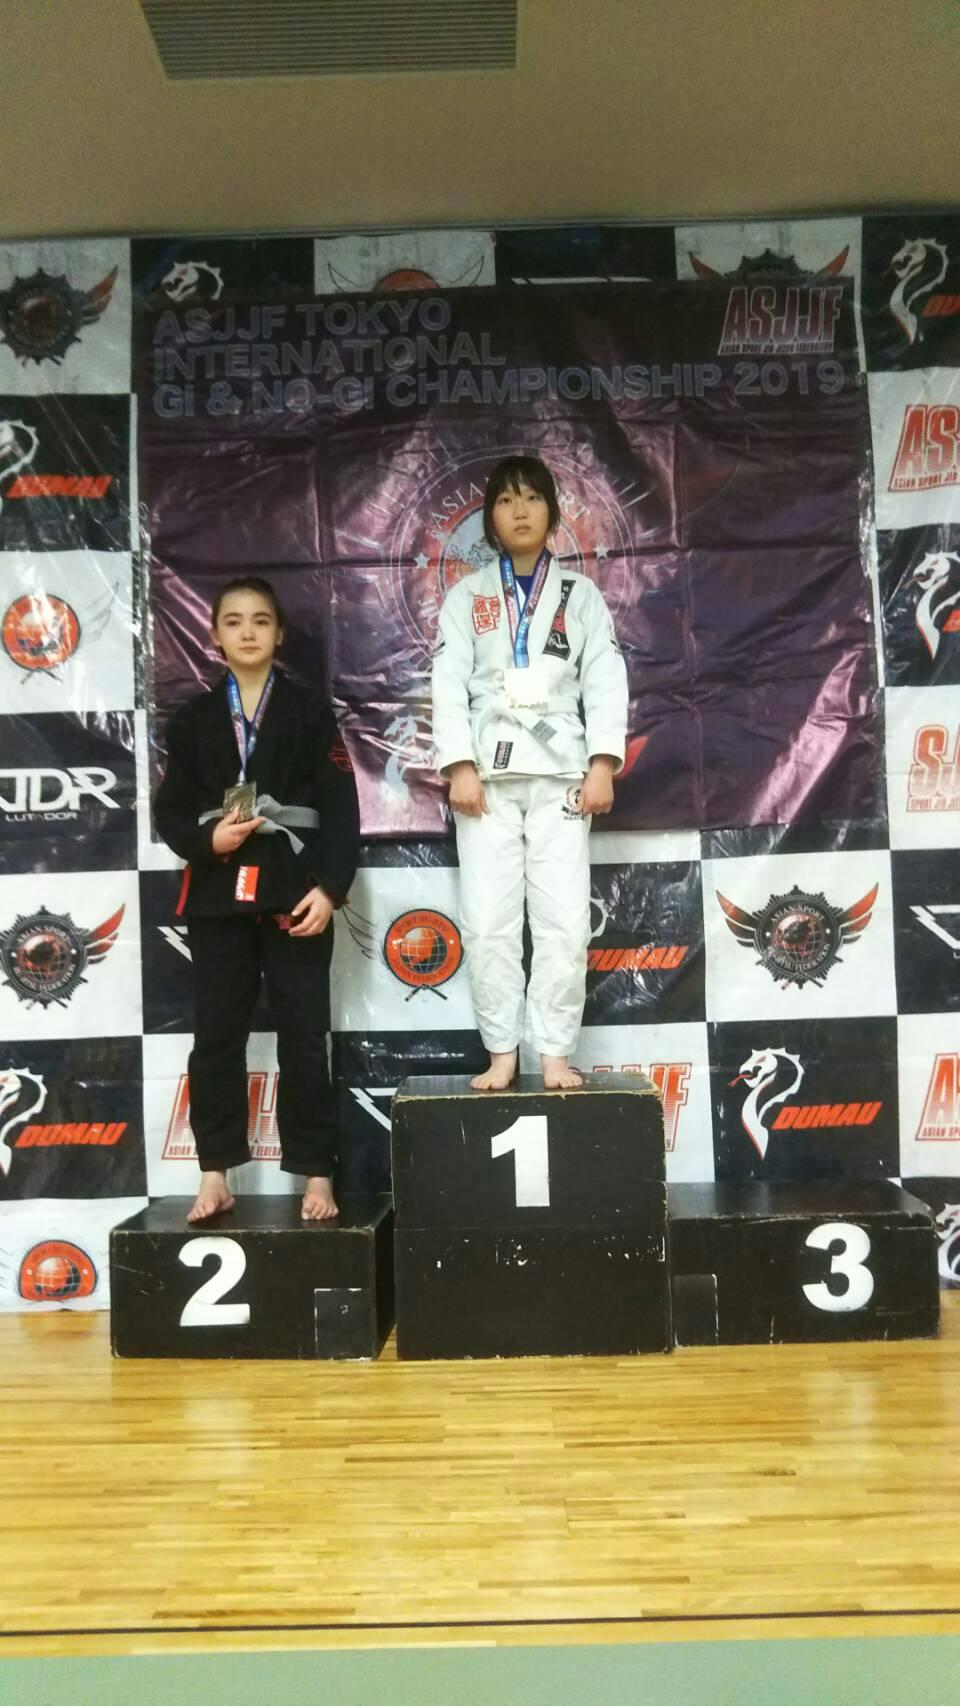 ASJJF 東京国際柔術選手権 2019 その1|大会写真02